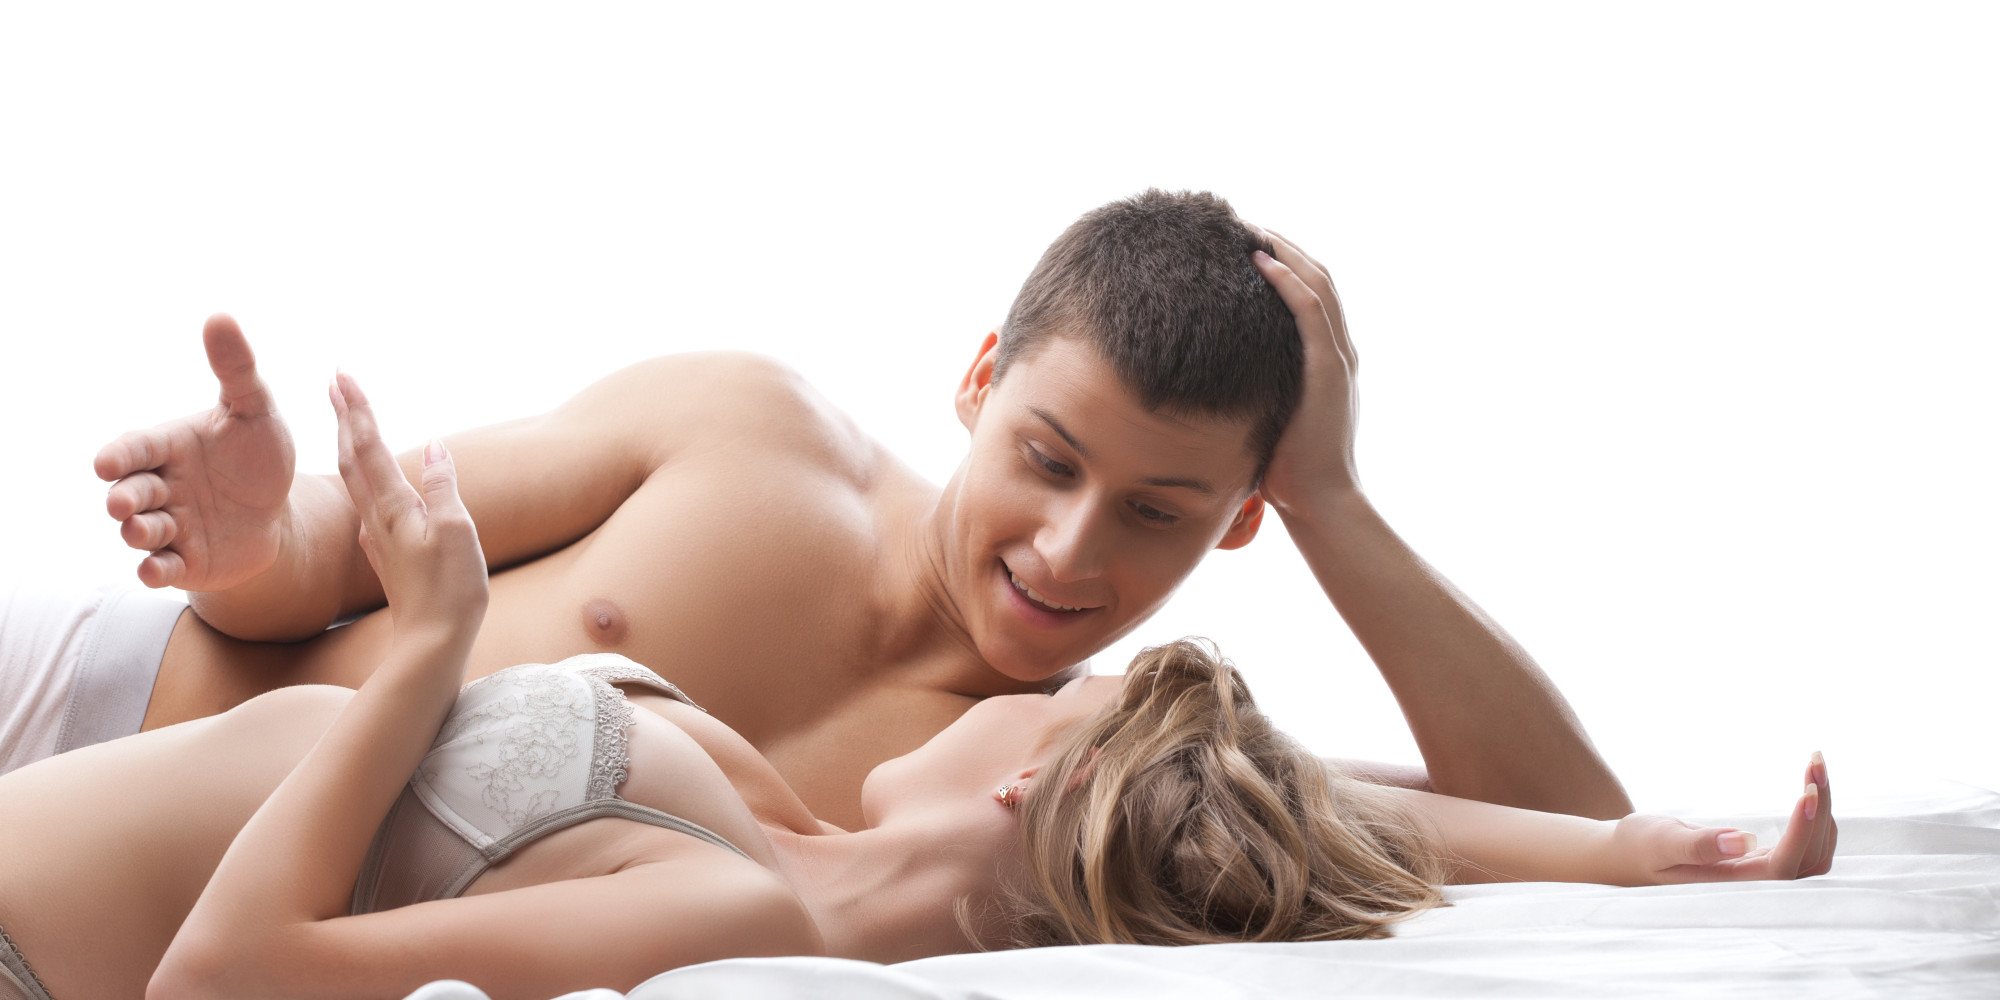 Что тебе нравится в сексе тест 2 фотография